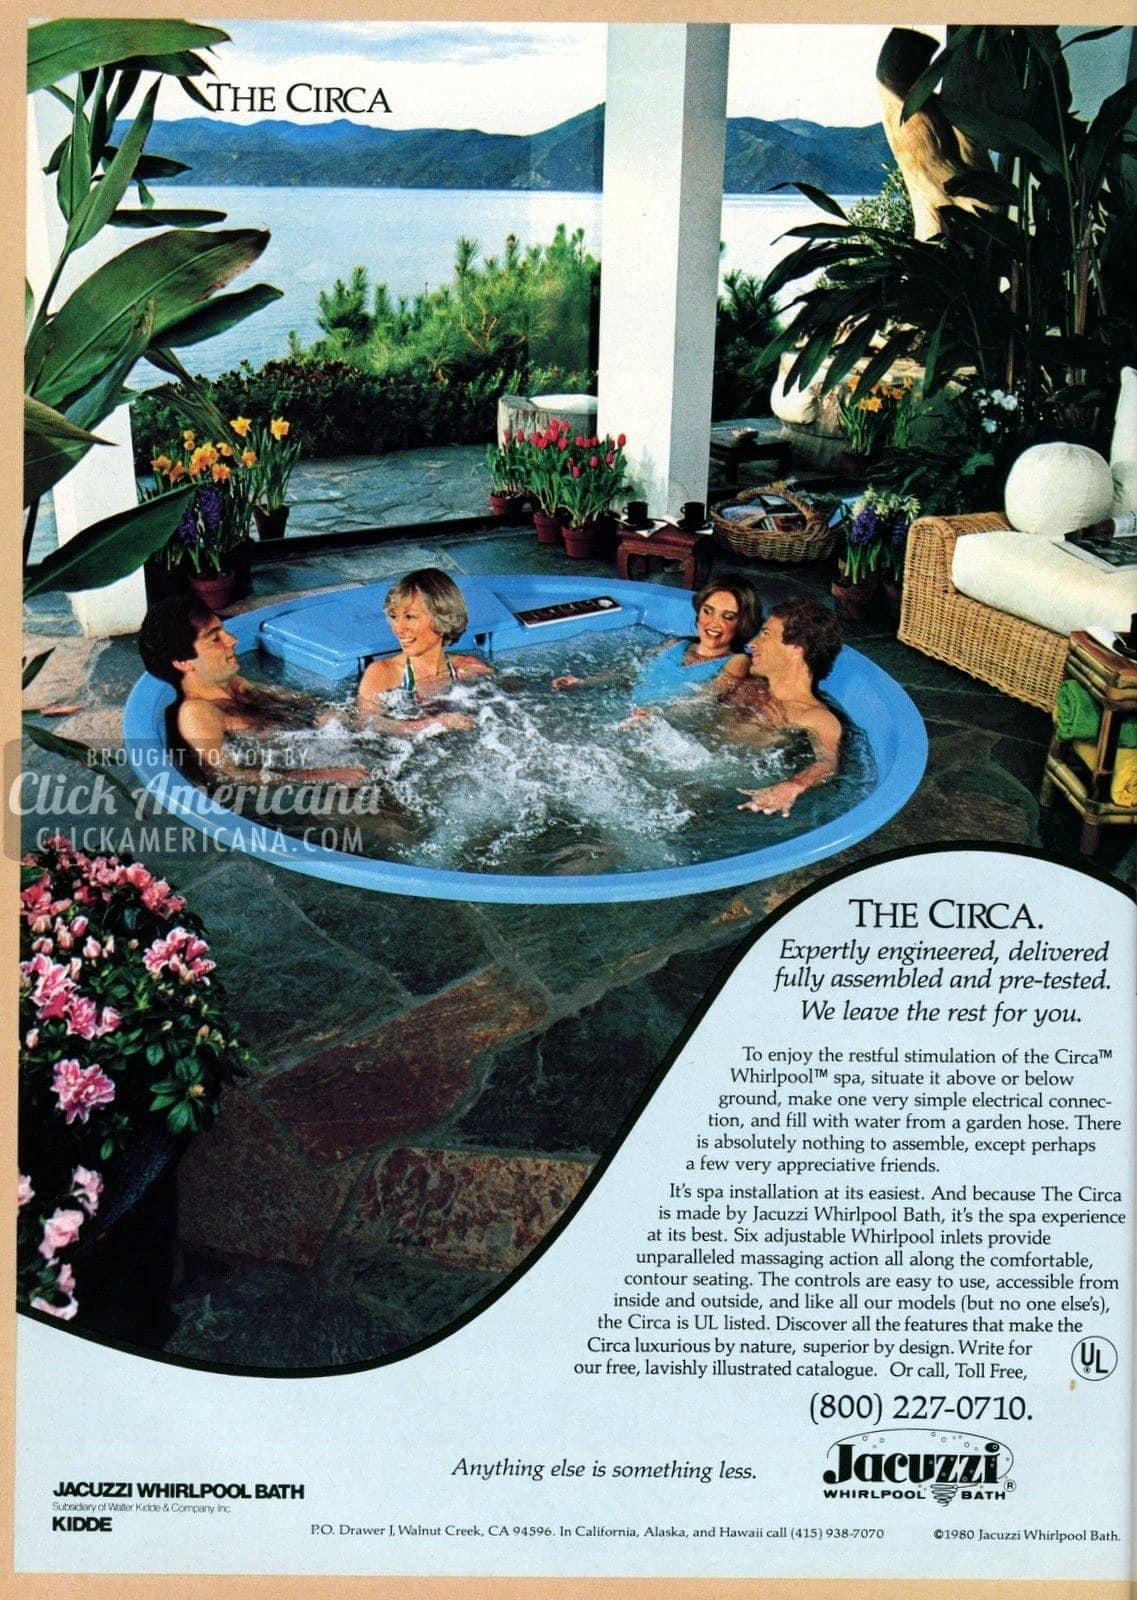 Backyard spa: Circa hot tub from Jacuzzi (1981) - Click Americana